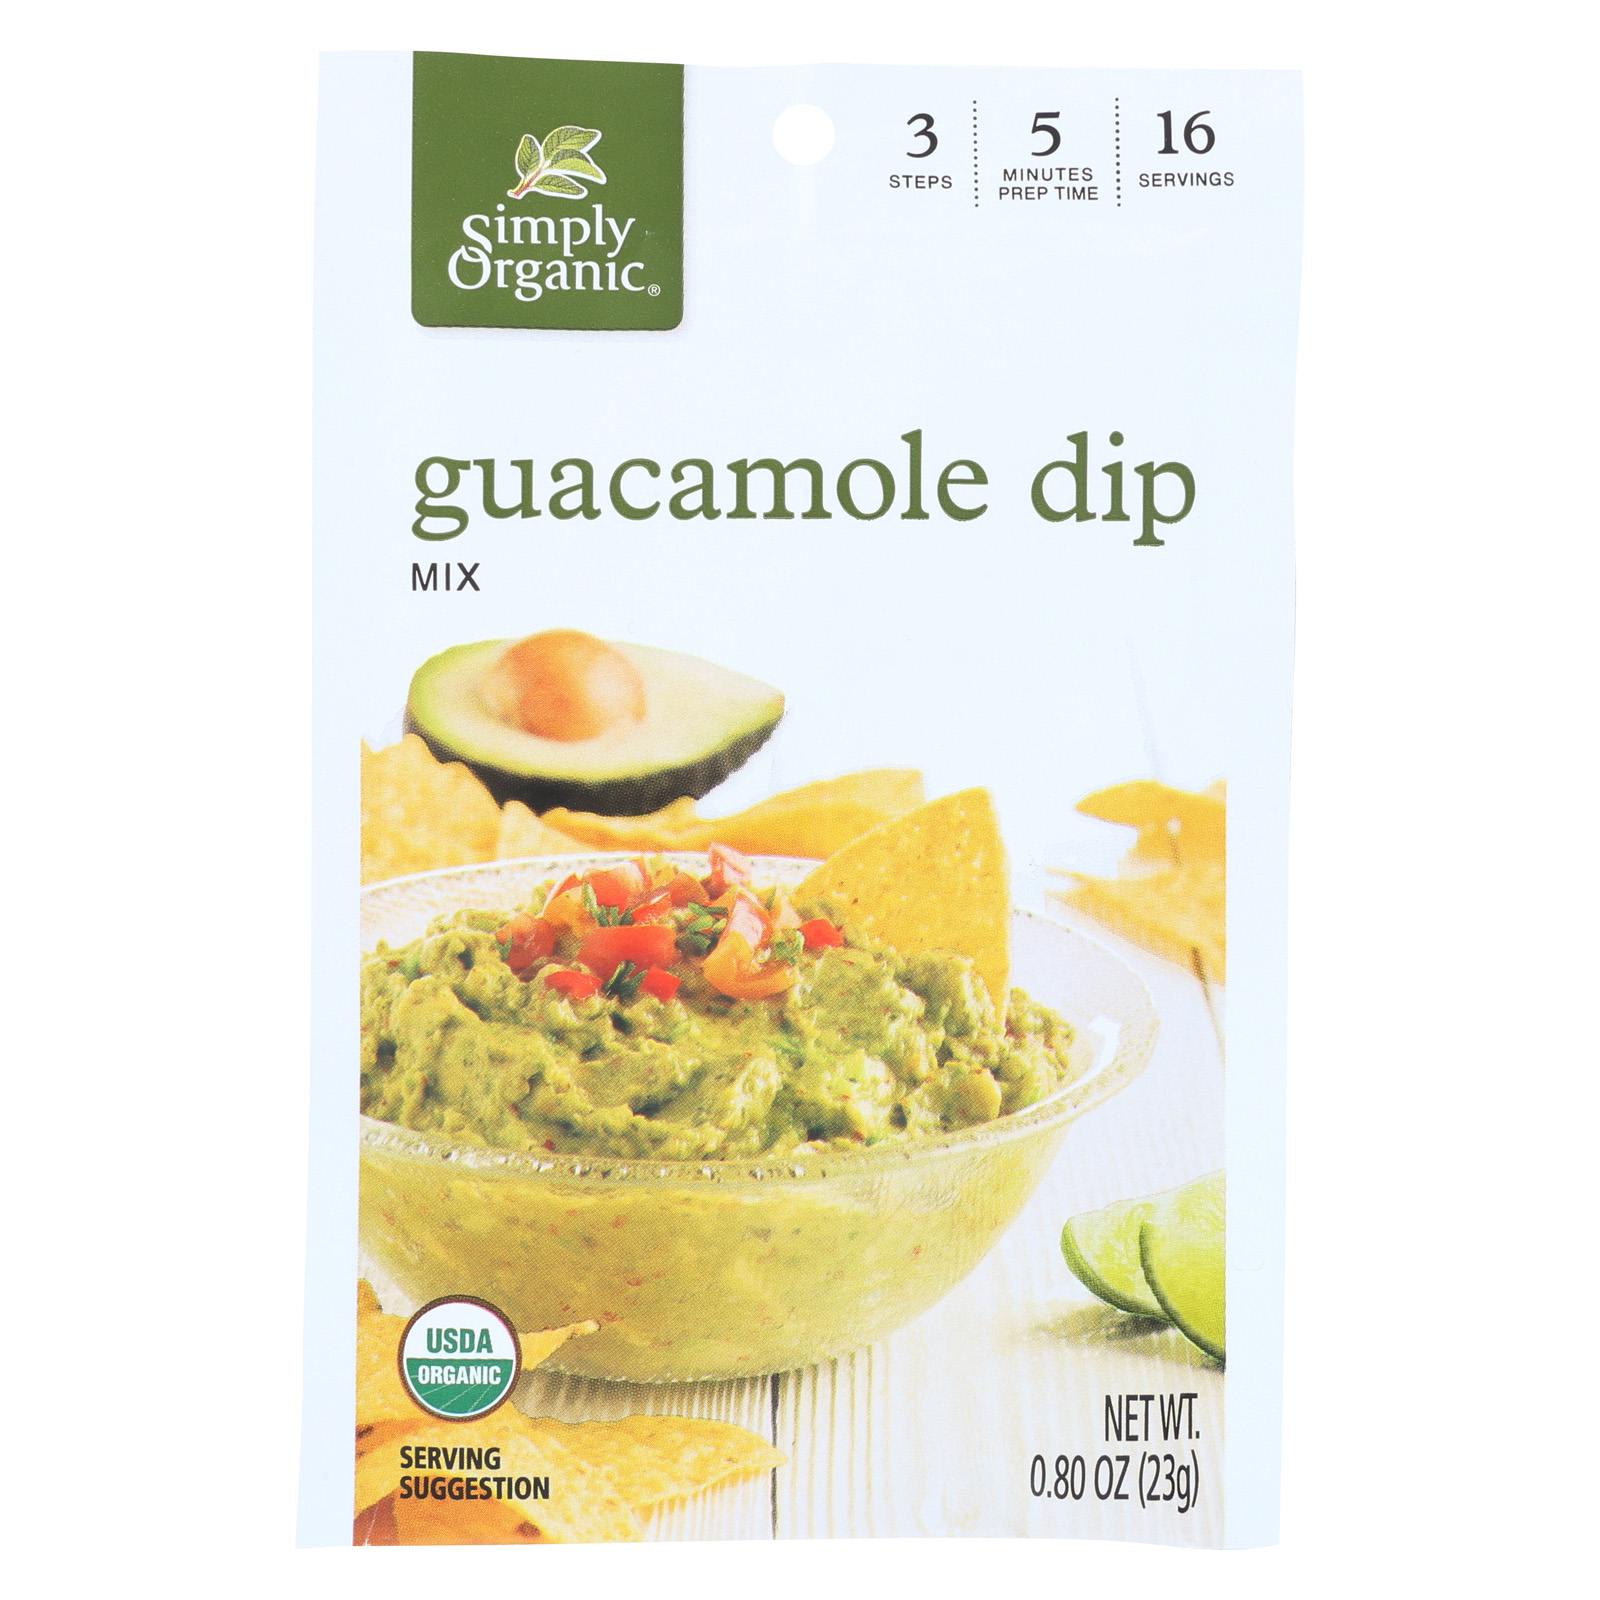 Simply Organic Guacamole Dip Mix Case of 12 0.8 oz. by